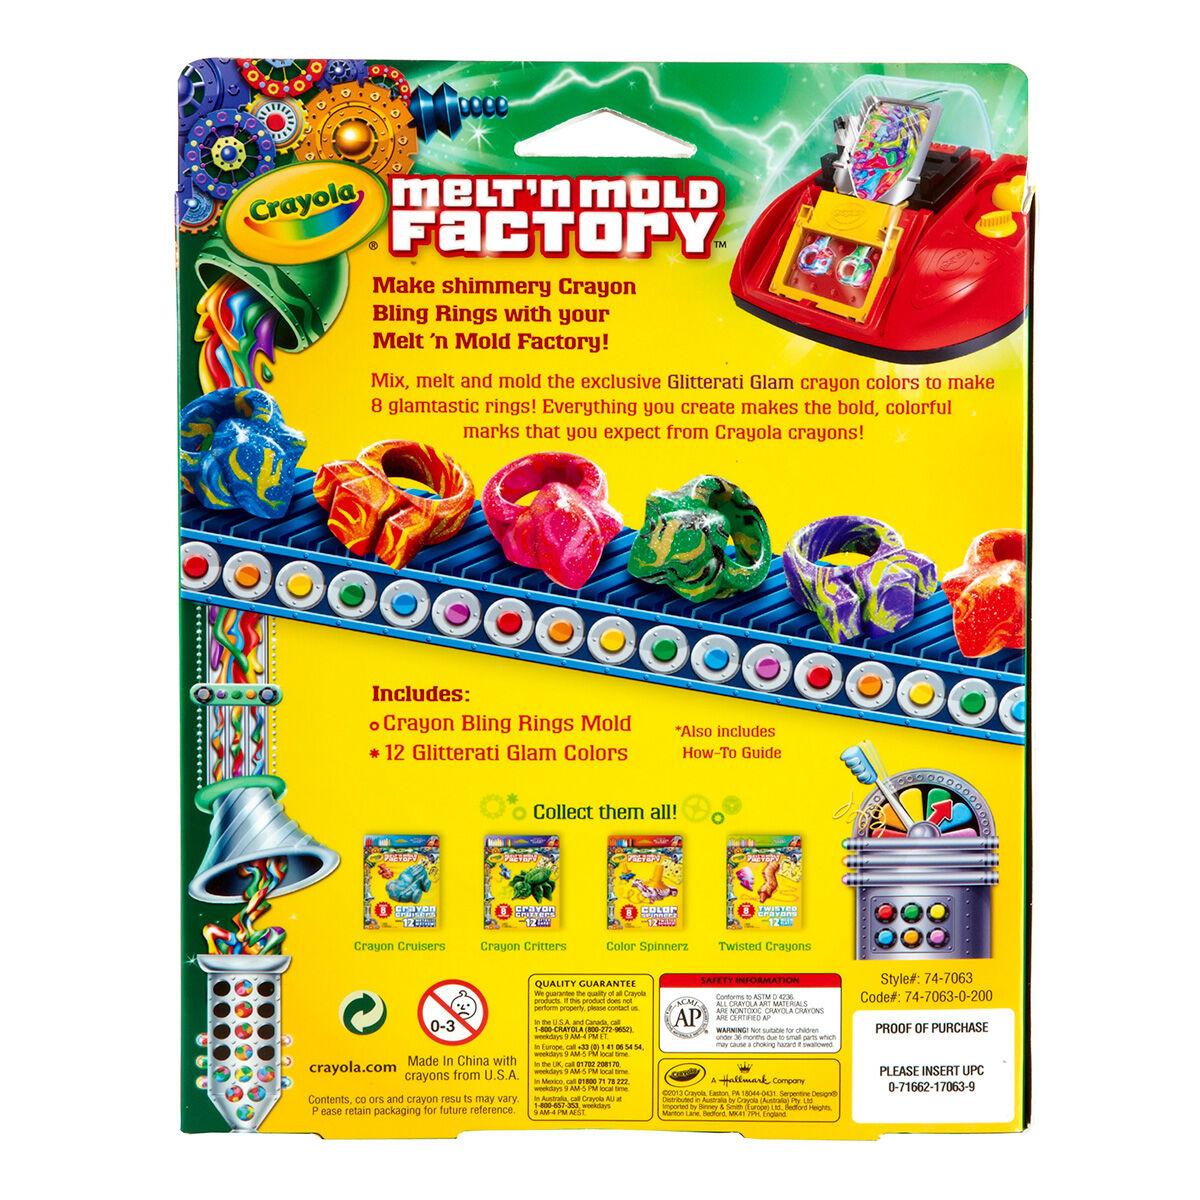 Crayon Rings Melt N Mold Factory Bling Rings Glitterati Glam Pack Crayola